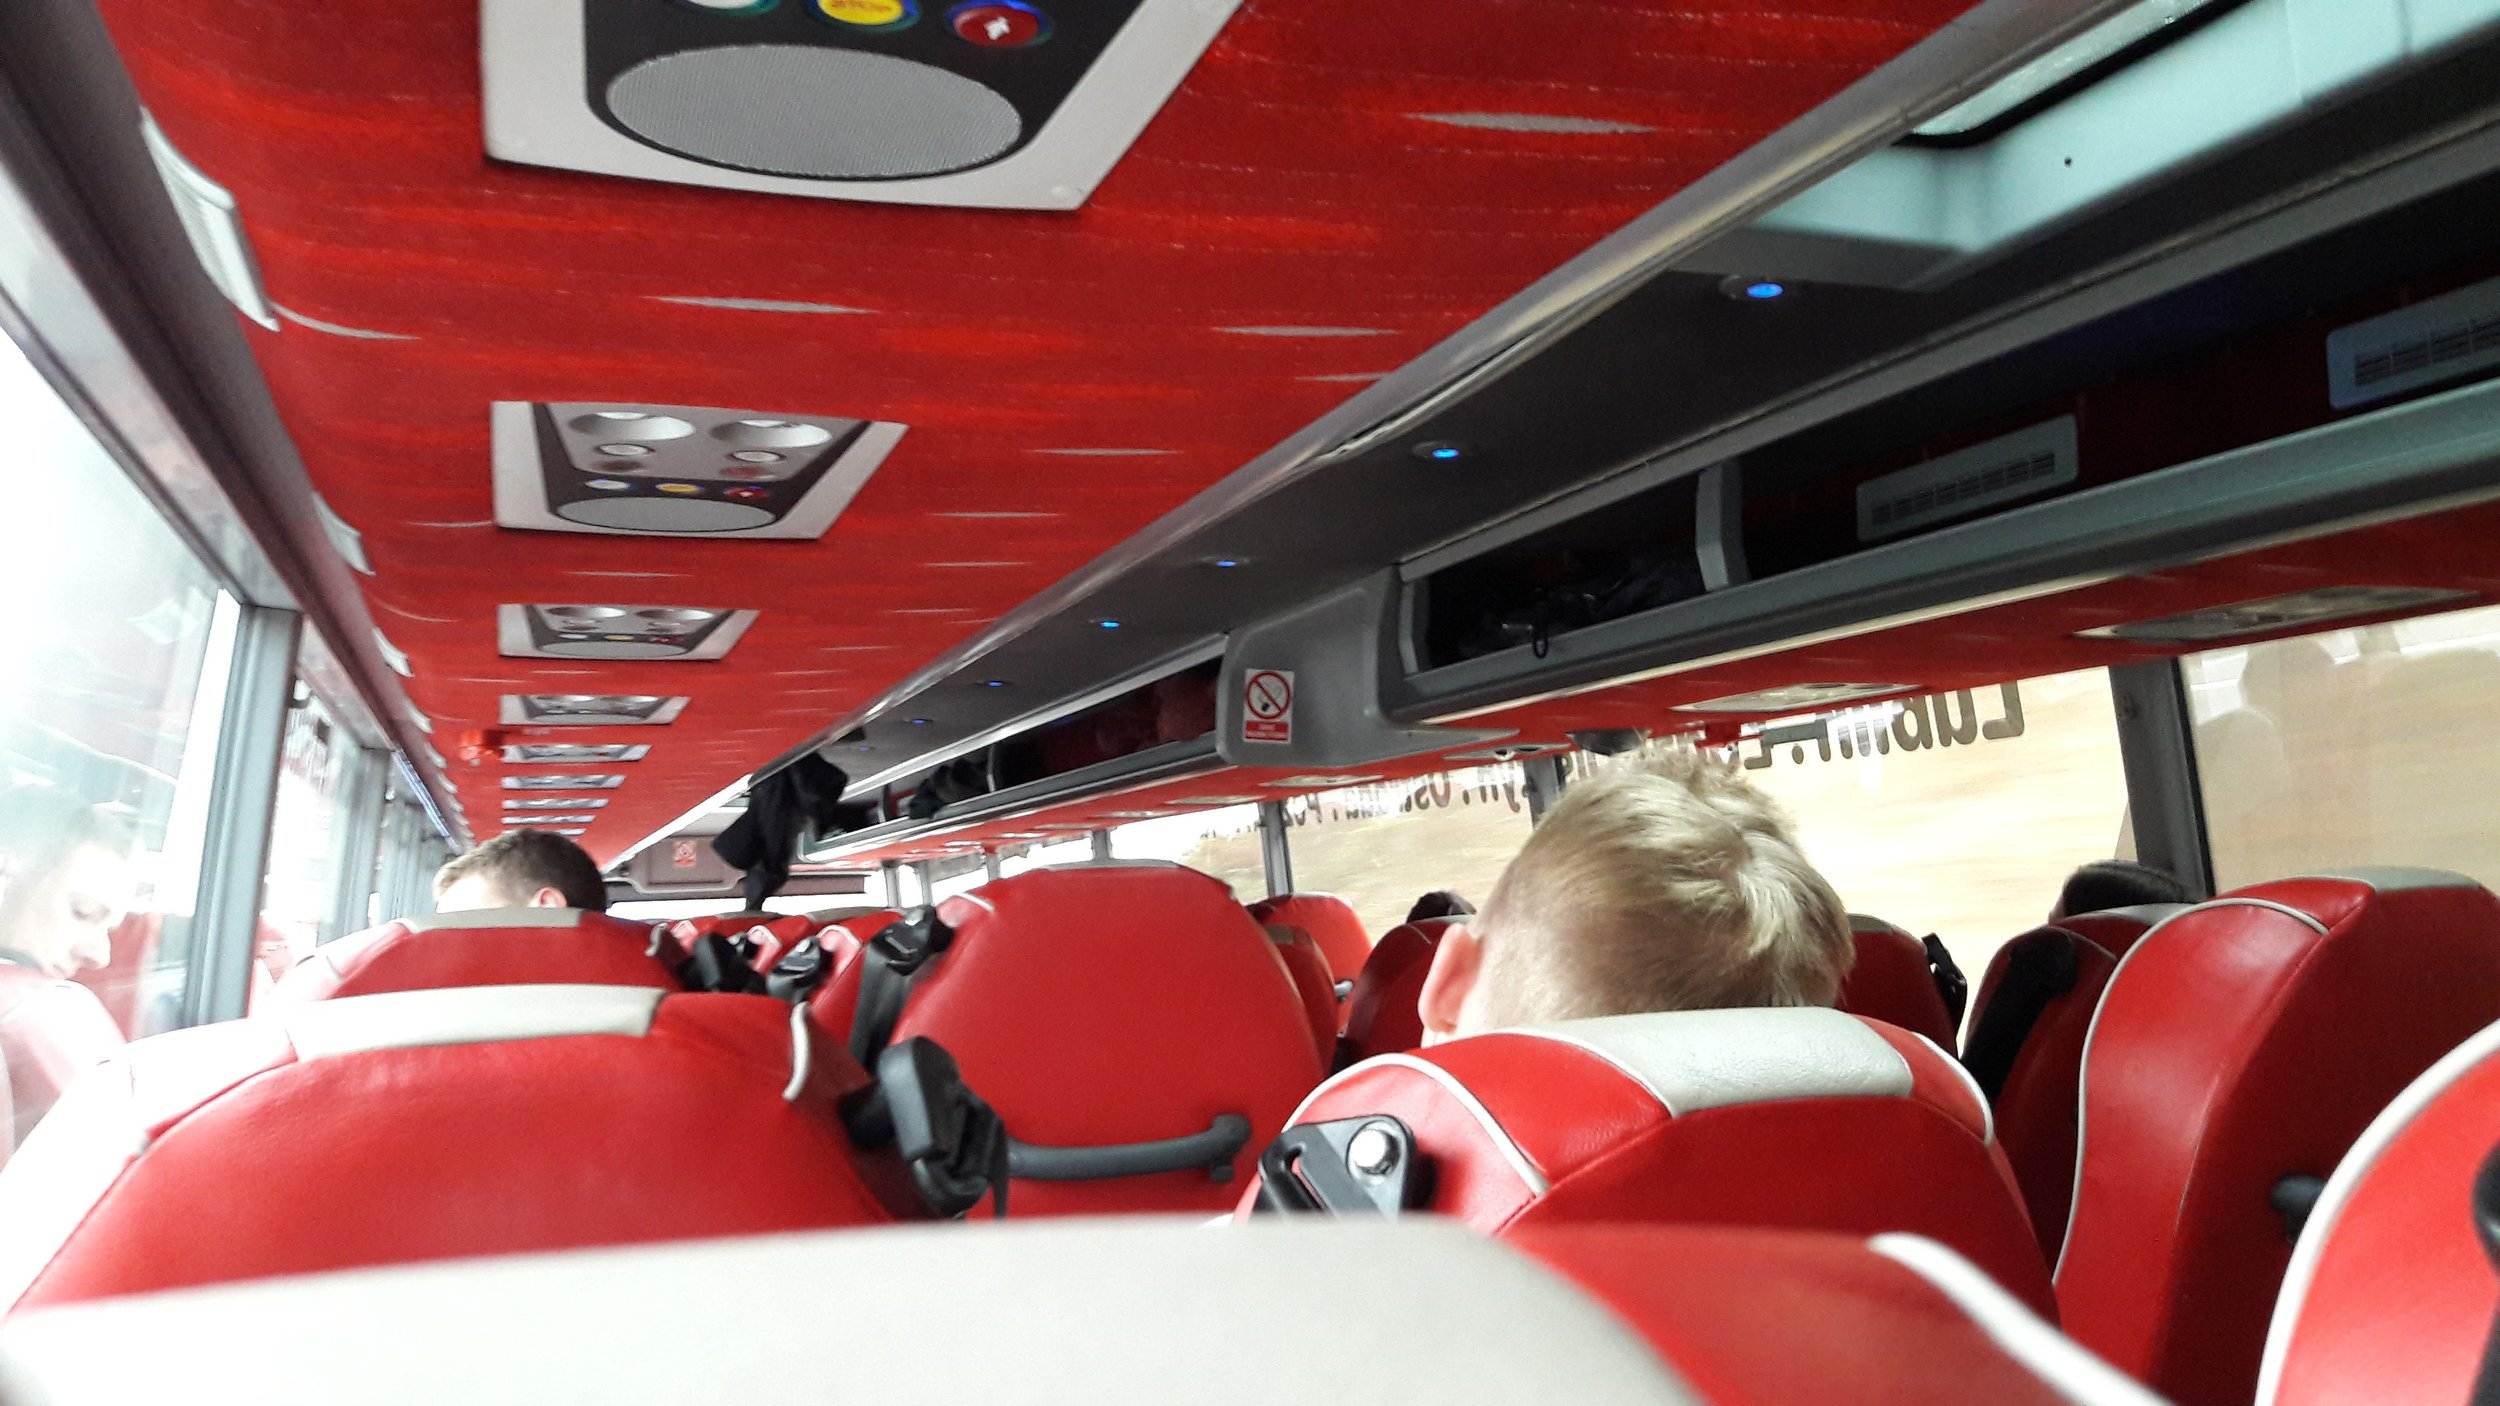 The Polski Bus from Prague